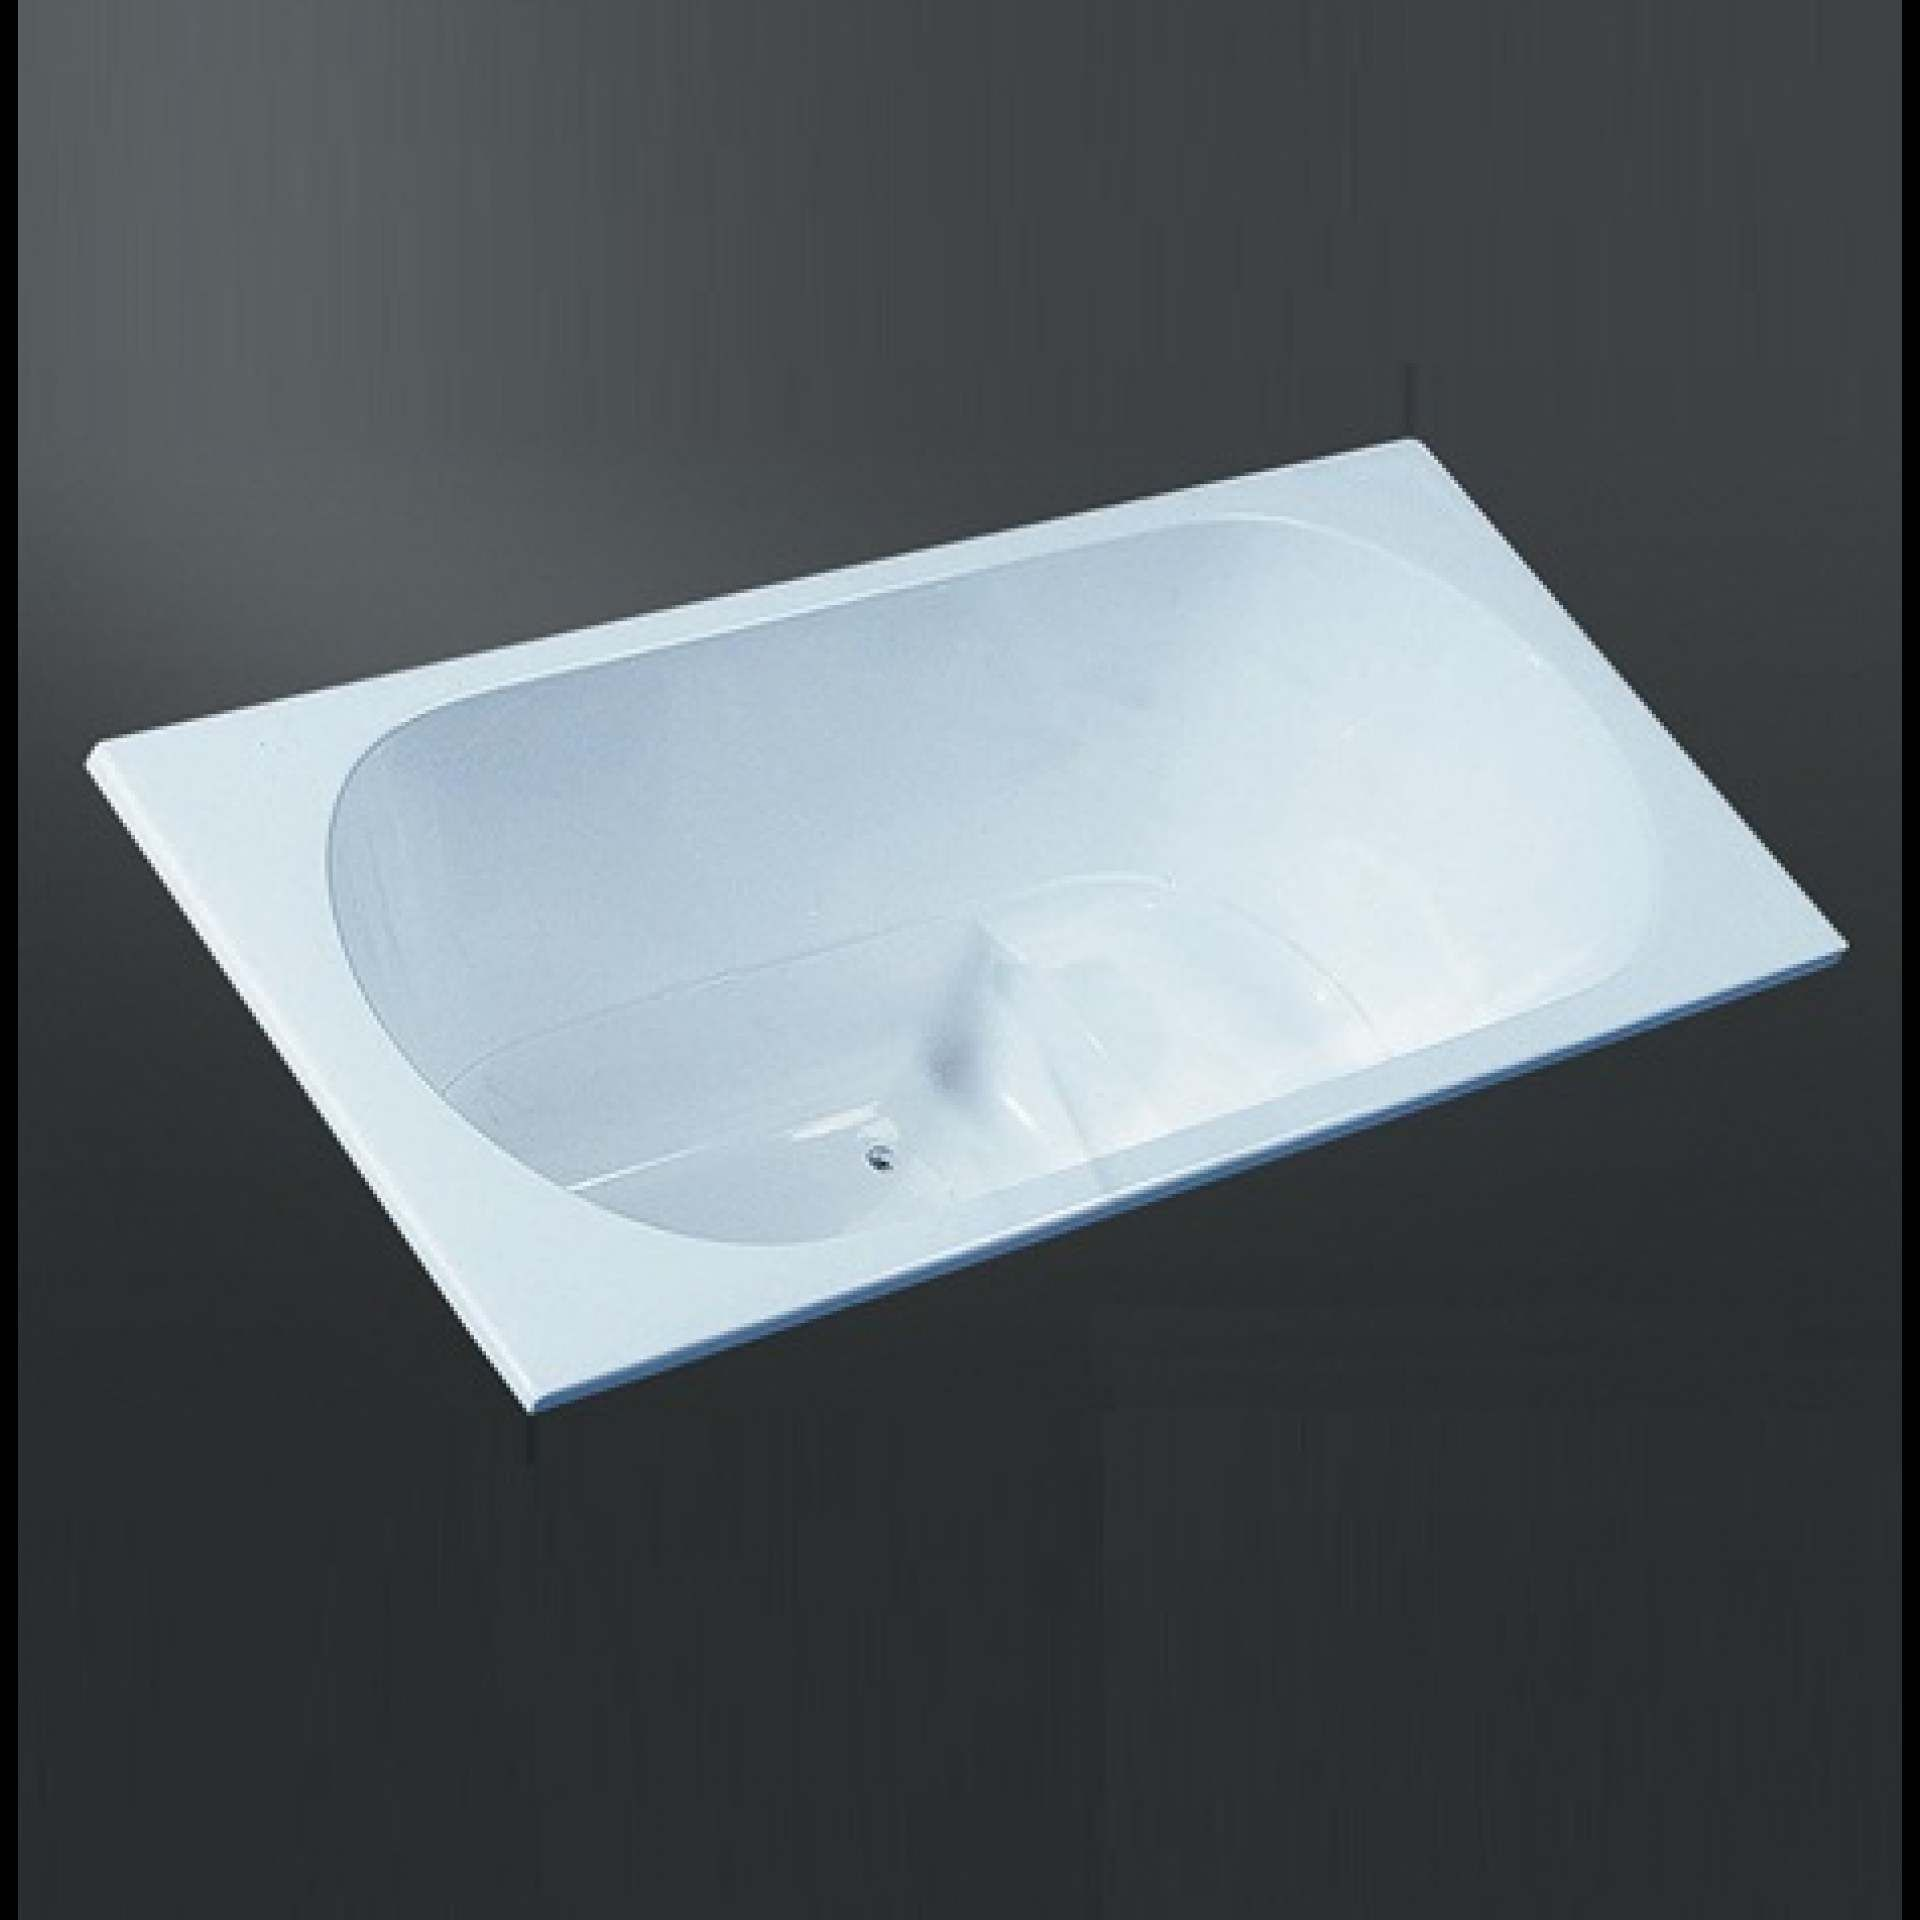 MODA FONDO Concealed Bath 8mm Thick Acrylic Gloss - Product Code: A ...